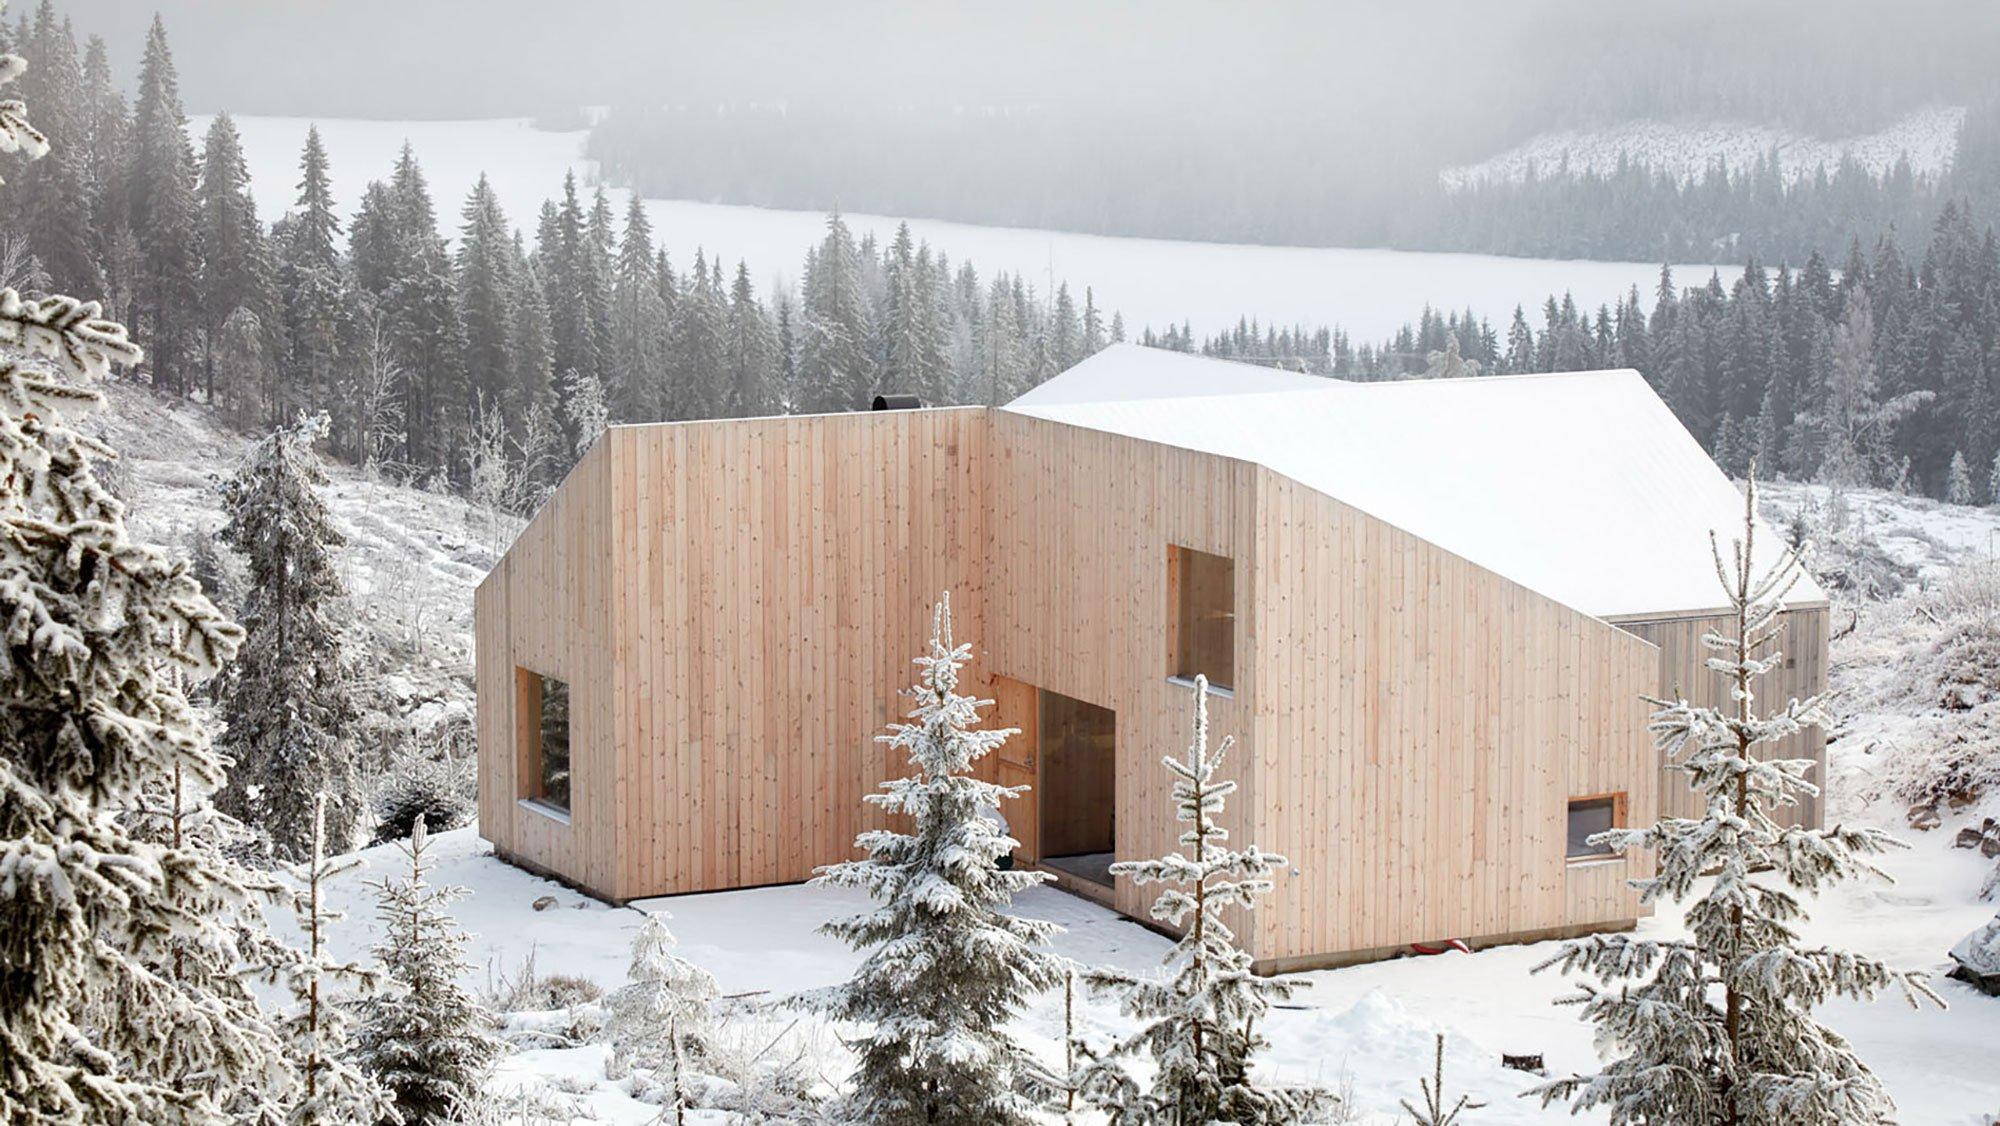 mylla-house-Mork-Ulnes Architects-Bruce-Damonte-PRINCIPAL